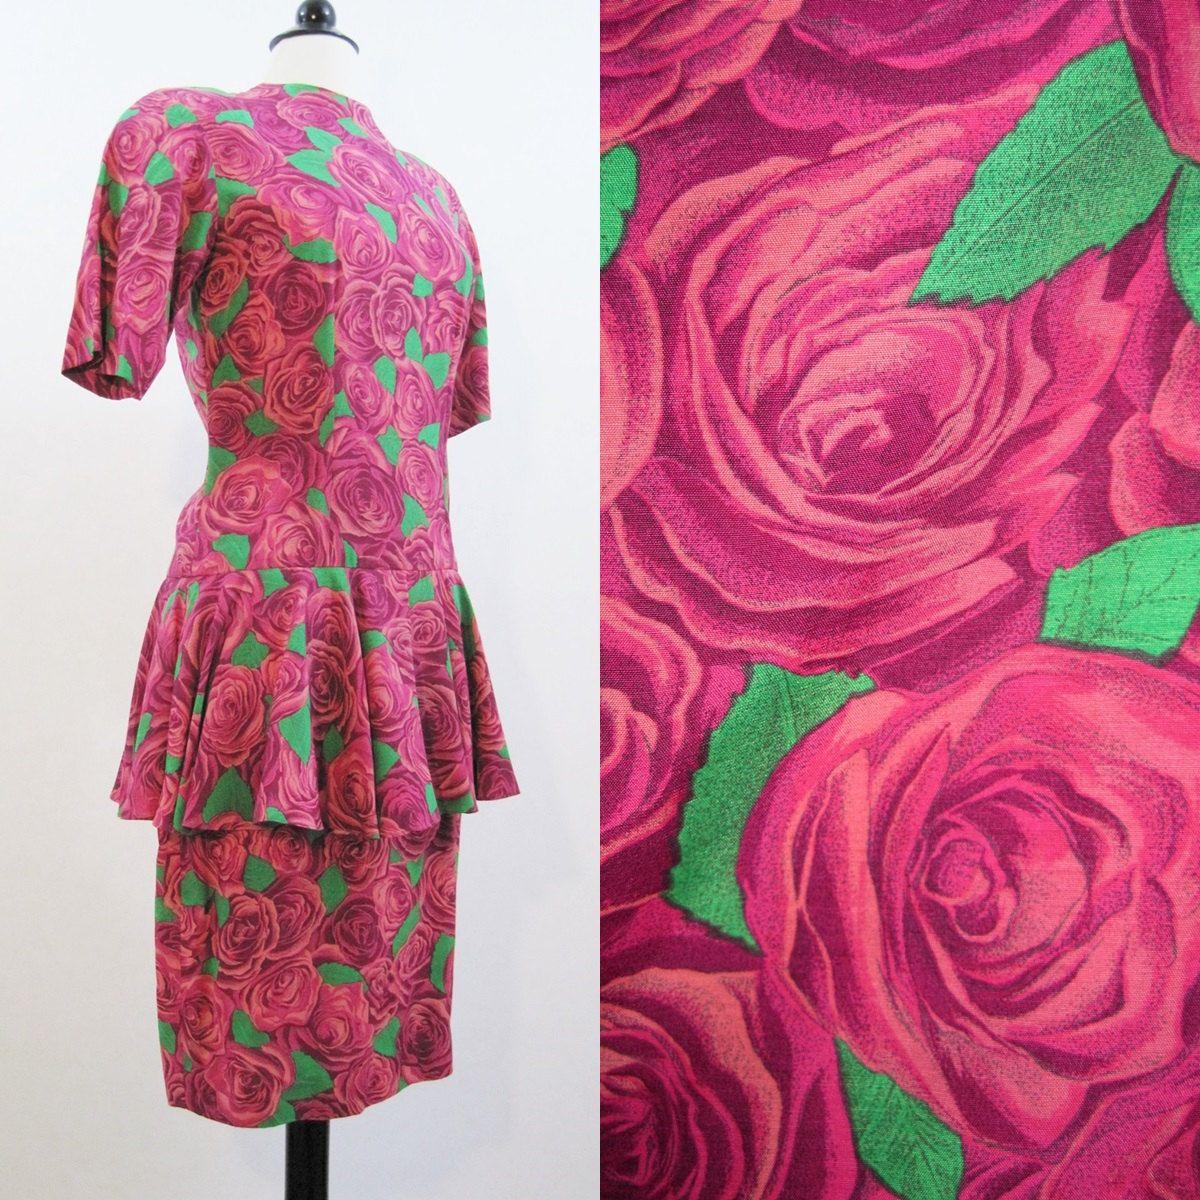 80s Dress Vintage Nicole Miller Roses Floral Pink Peplum Day Dress S ...